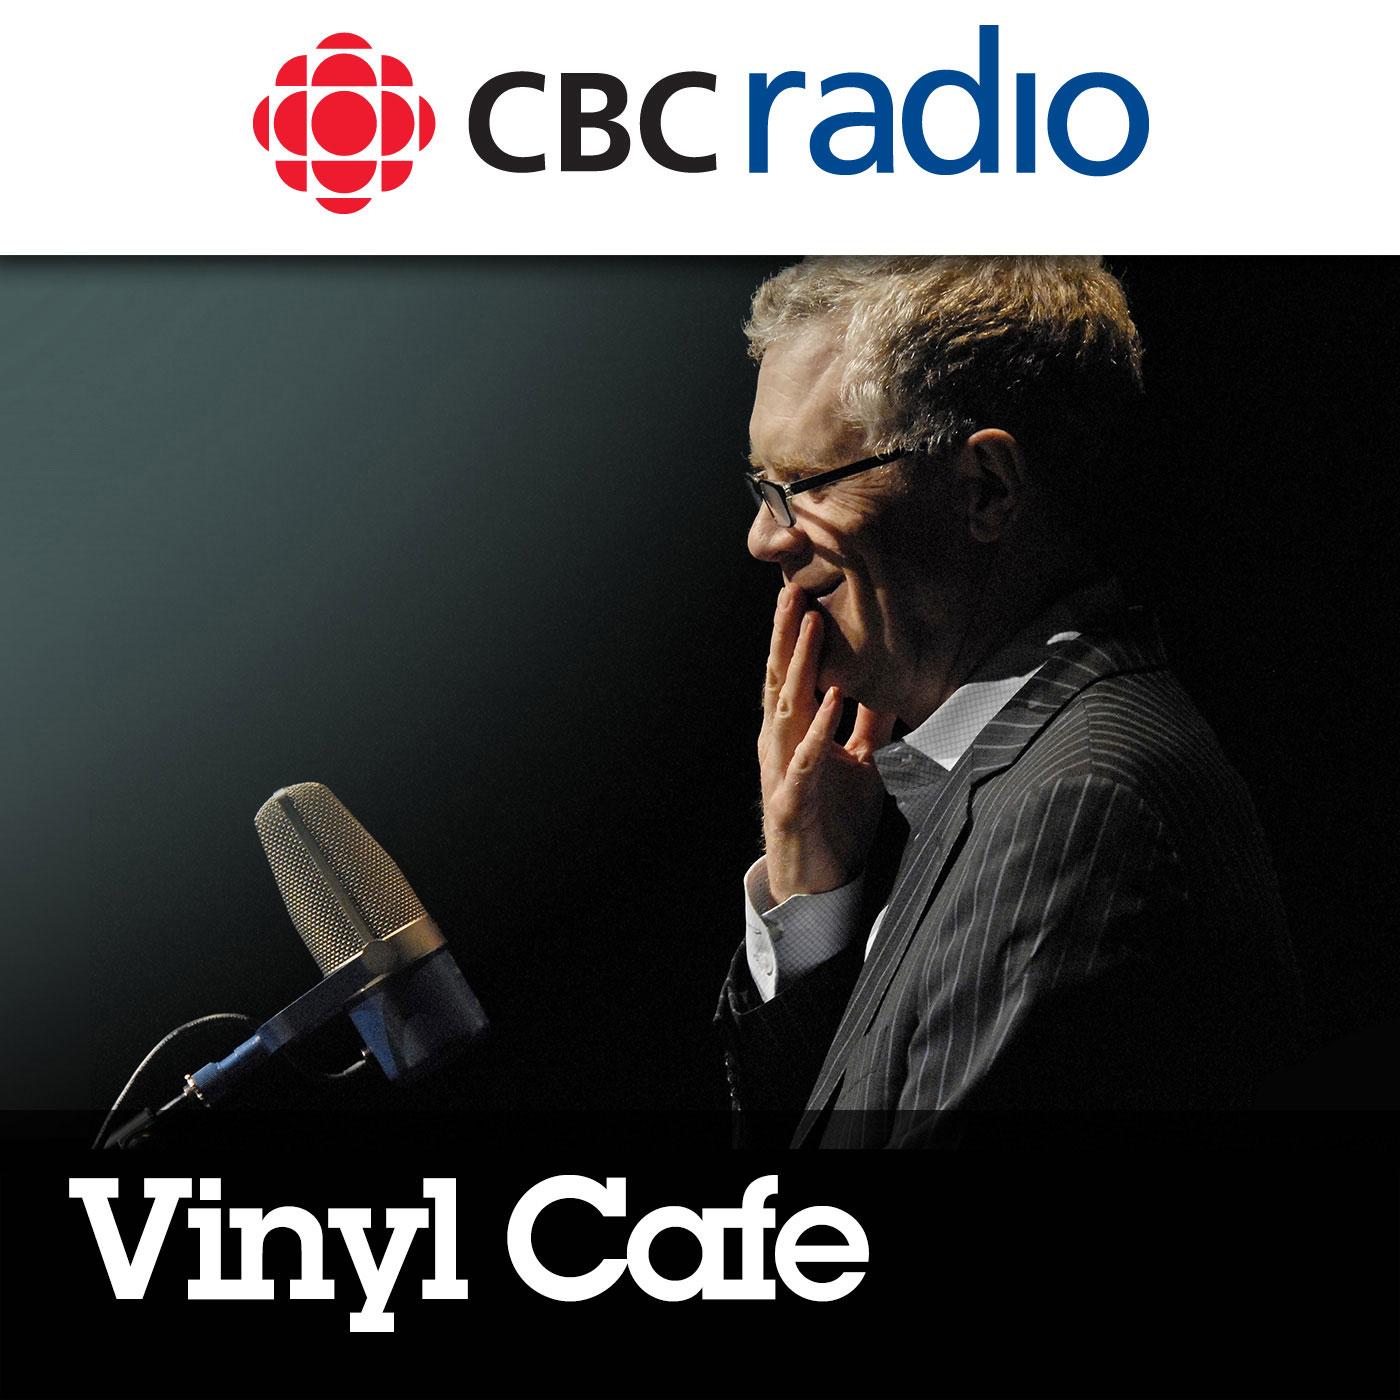 Source: CBC Radio